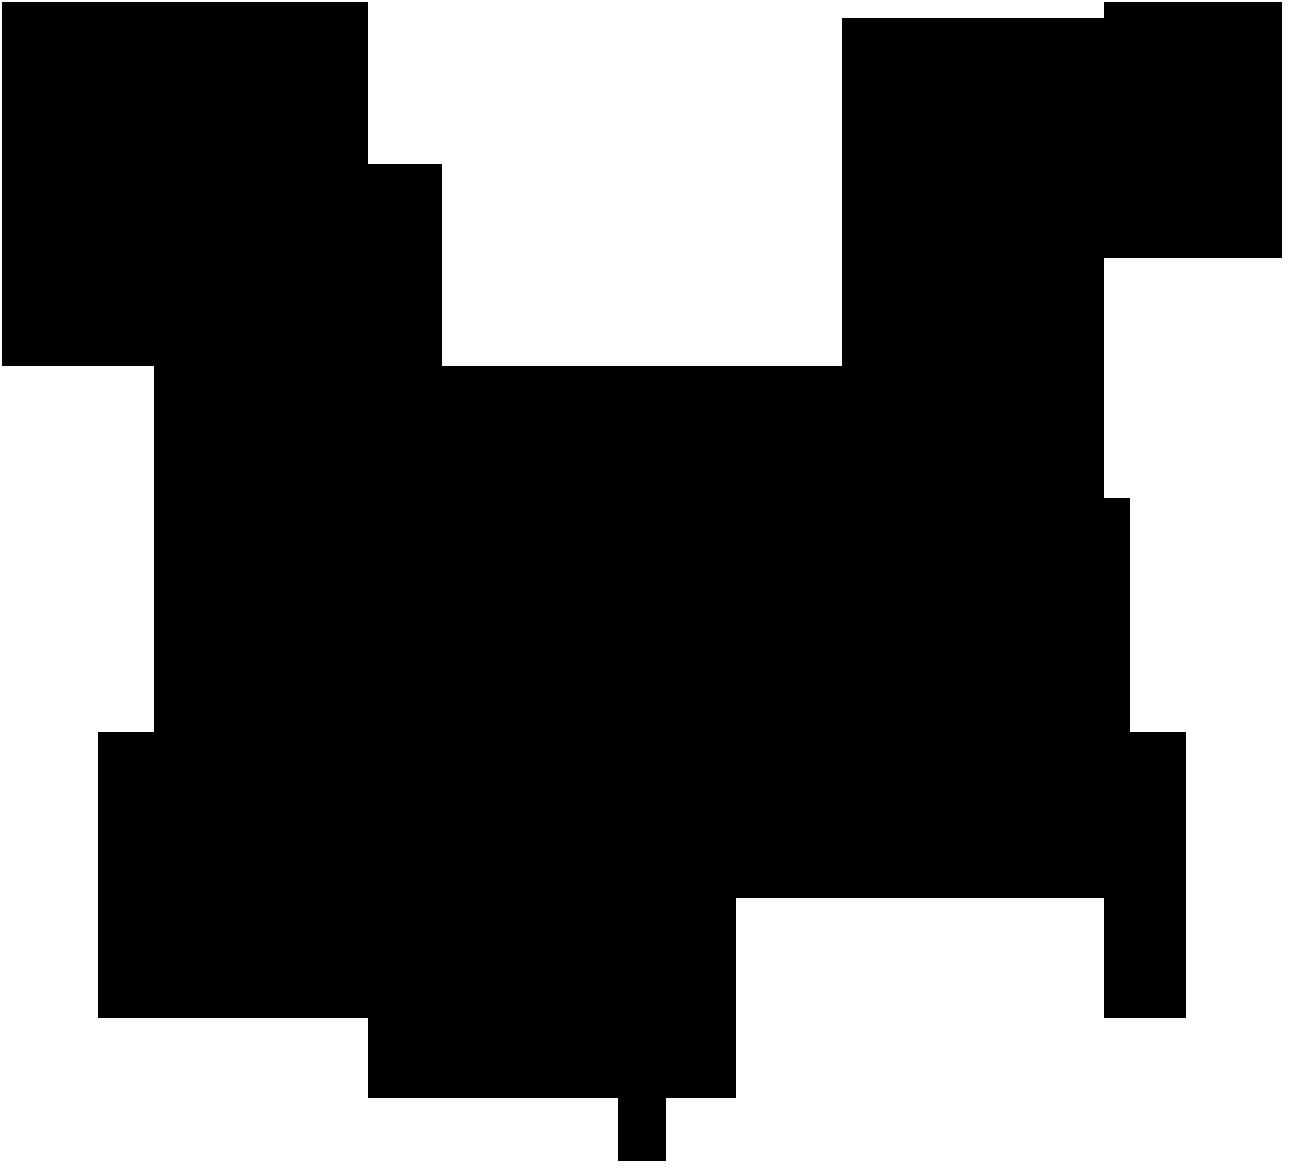 Ray Vermillion Noel_Vermillion_(Emblem,_Crest)